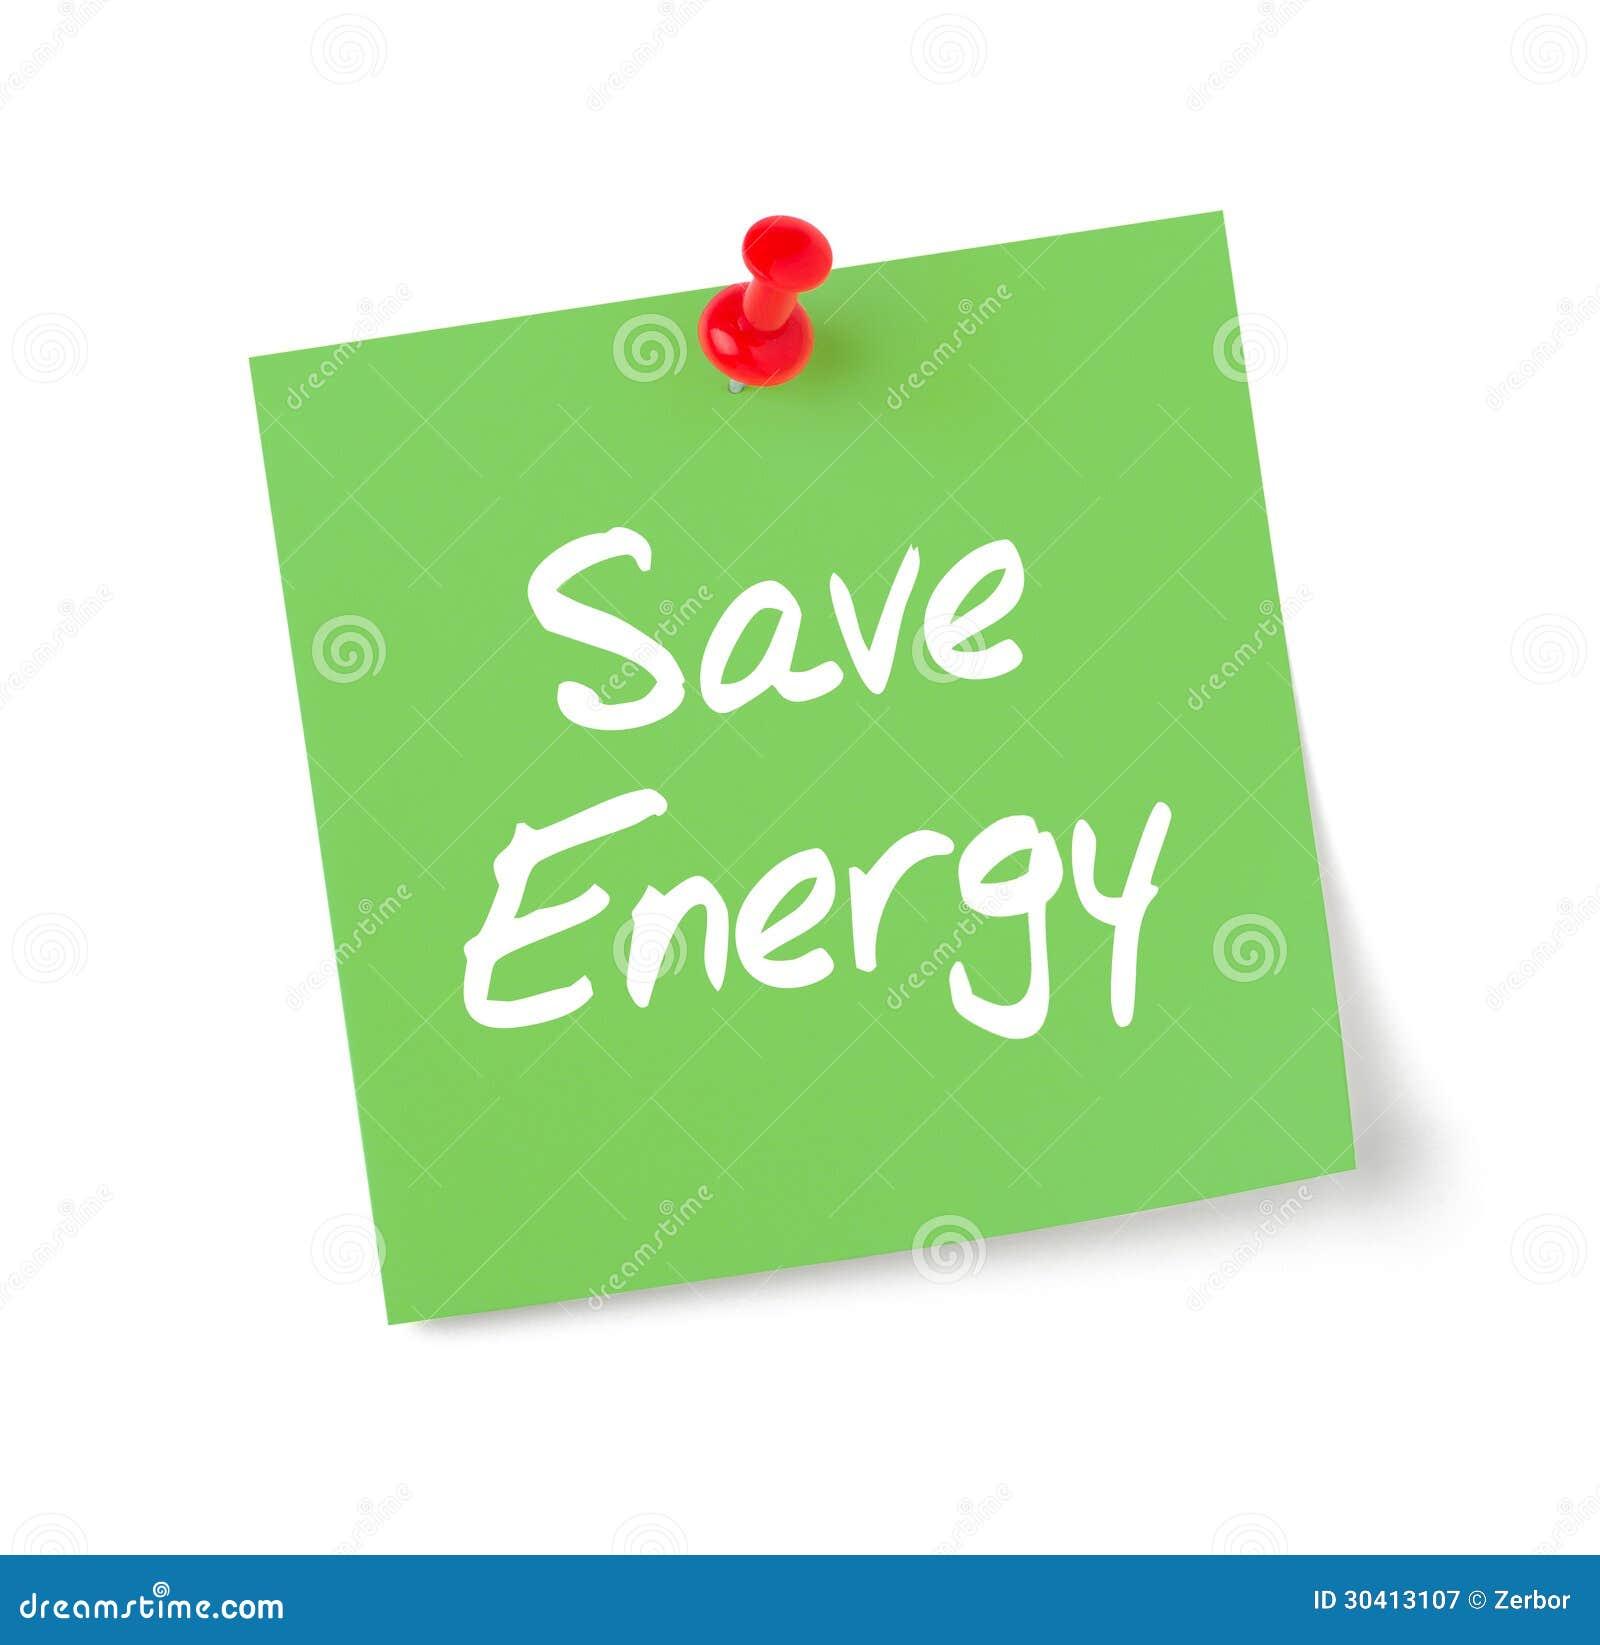 save fuel save money essay Save trees essay for students, kids and children given here marathi, malayalam, tamil, hindi, telugu, english, french, german, greek, bengali, punjabi, short essay.